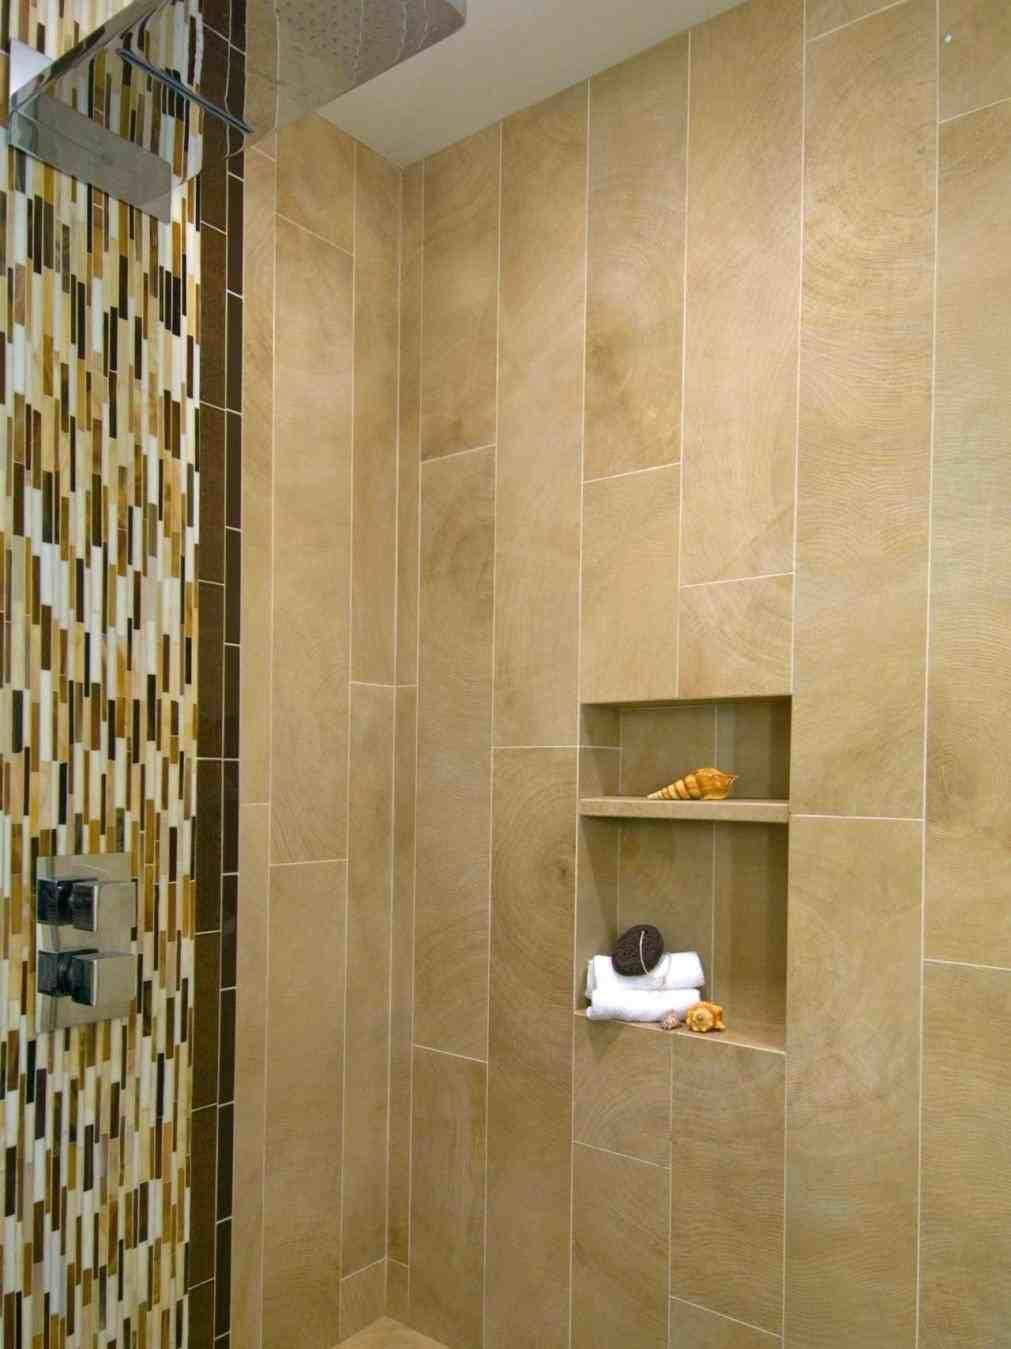 Etonnant New Post Vertical Discharge Bathroom Fan